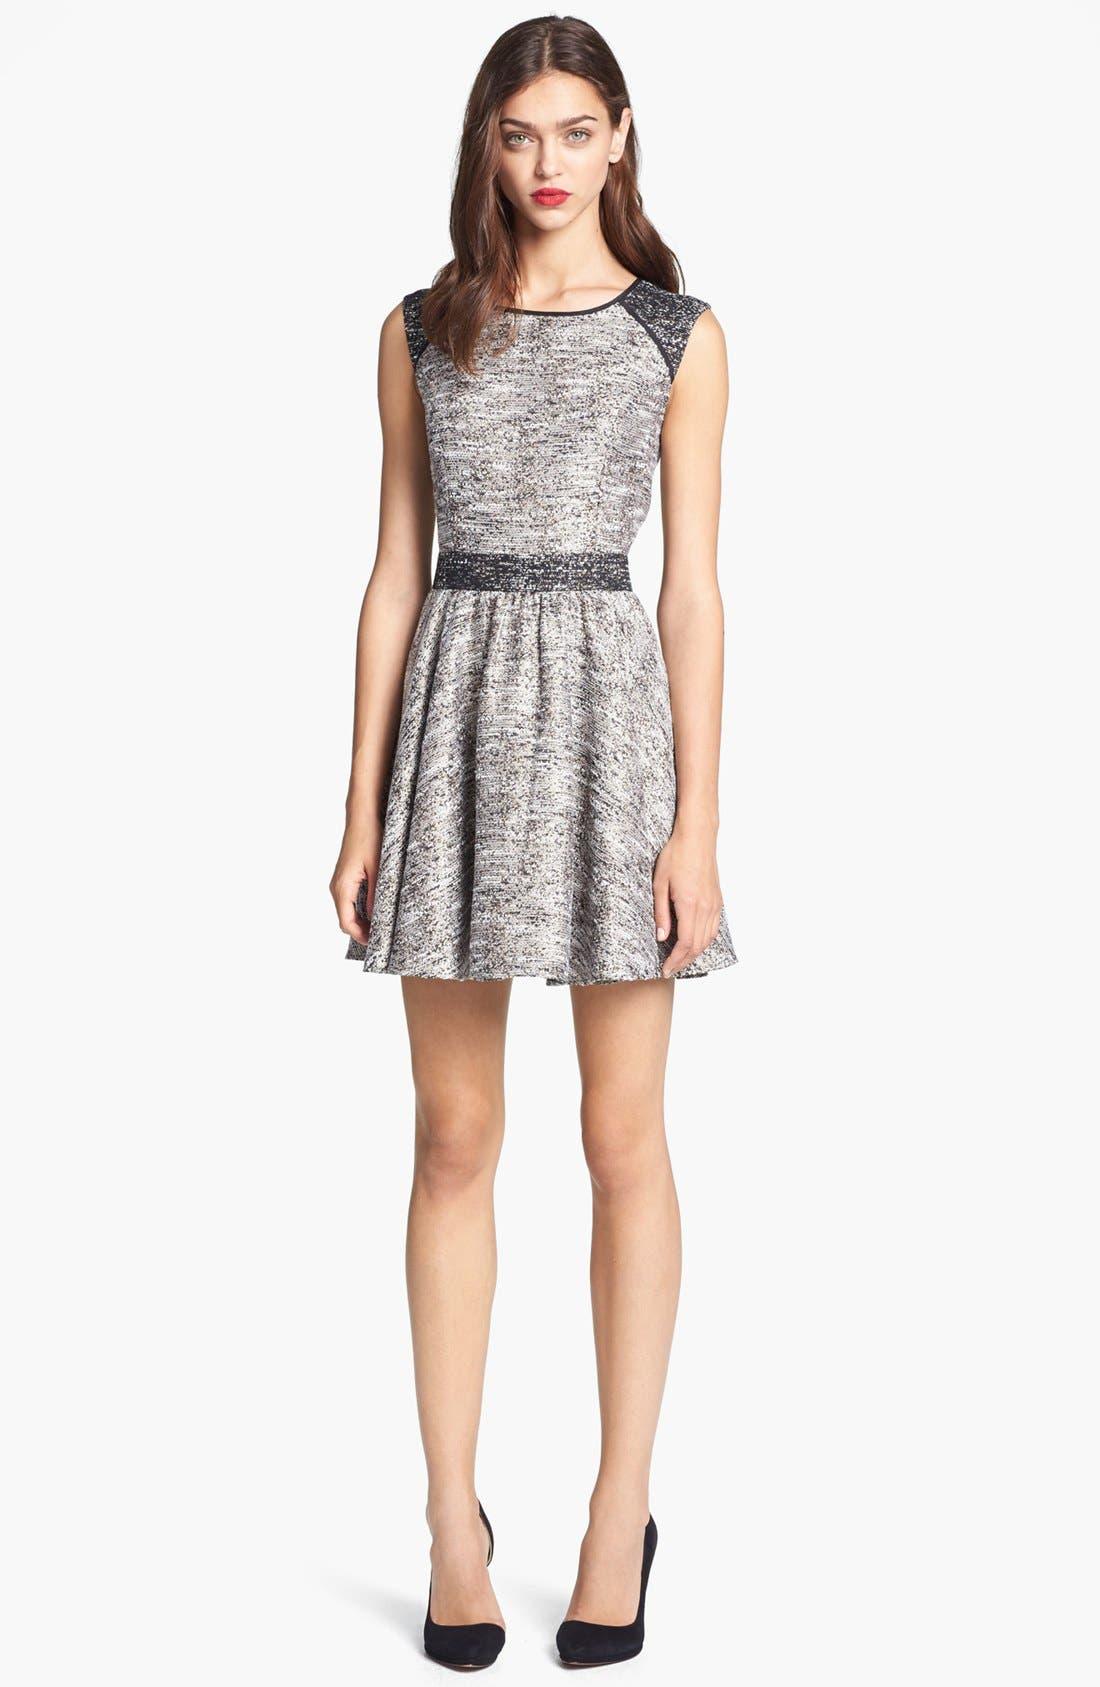 Alternate Image 1 Selected - Rachel Zoe 'Marley' Flared Metallic Tweed Dress